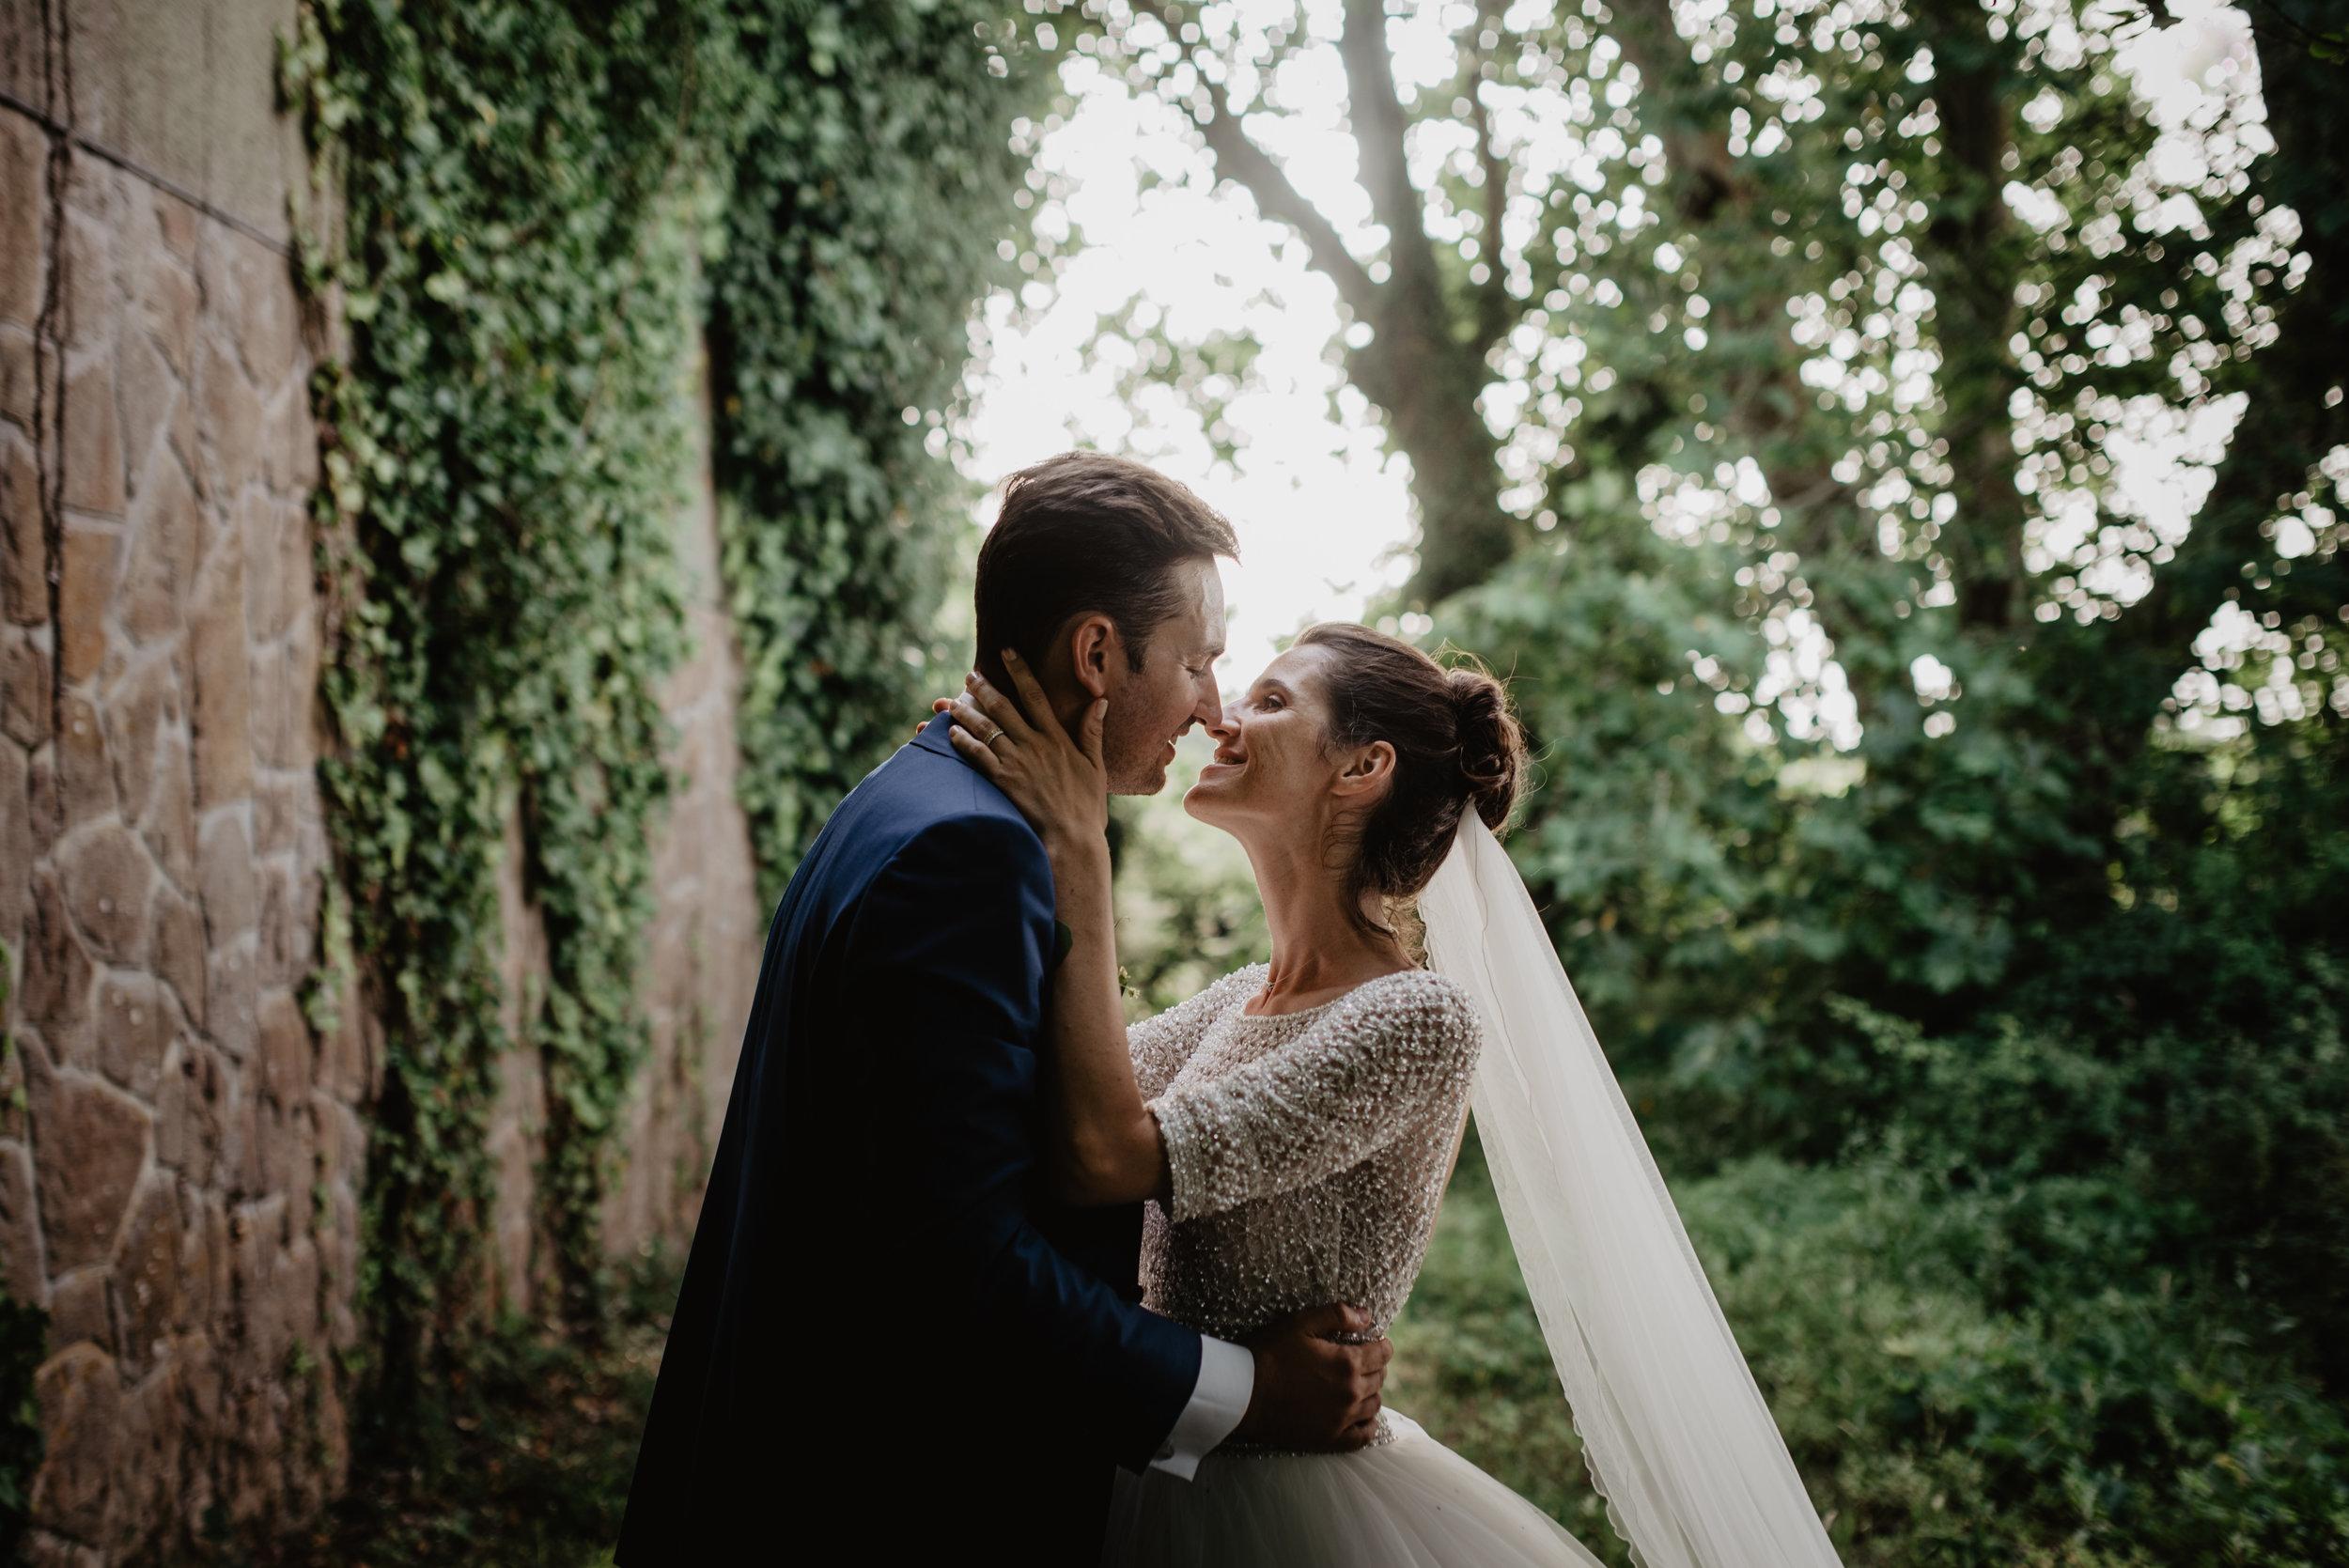 Lapela-photography-wedding-sintra-portugal-101.jpg